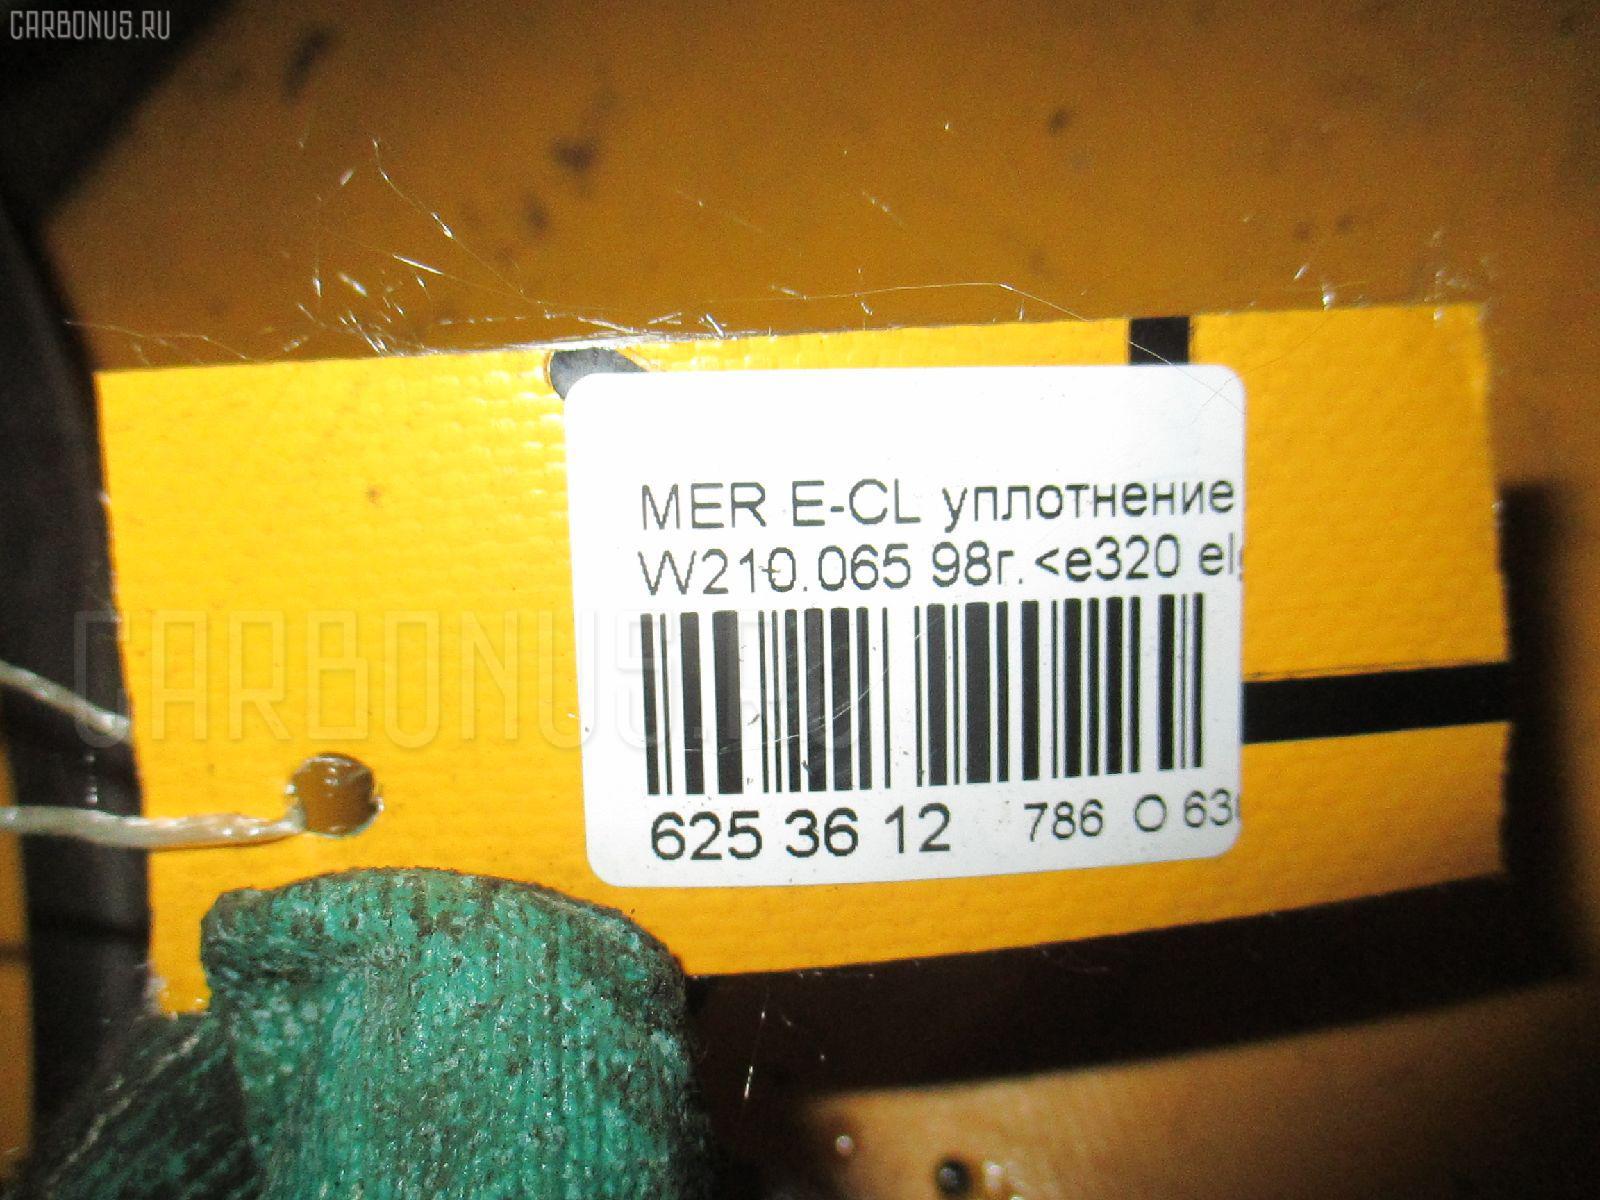 Уплотнение MERCEDES-BENZ E-CLASS W210.065 Фото 2